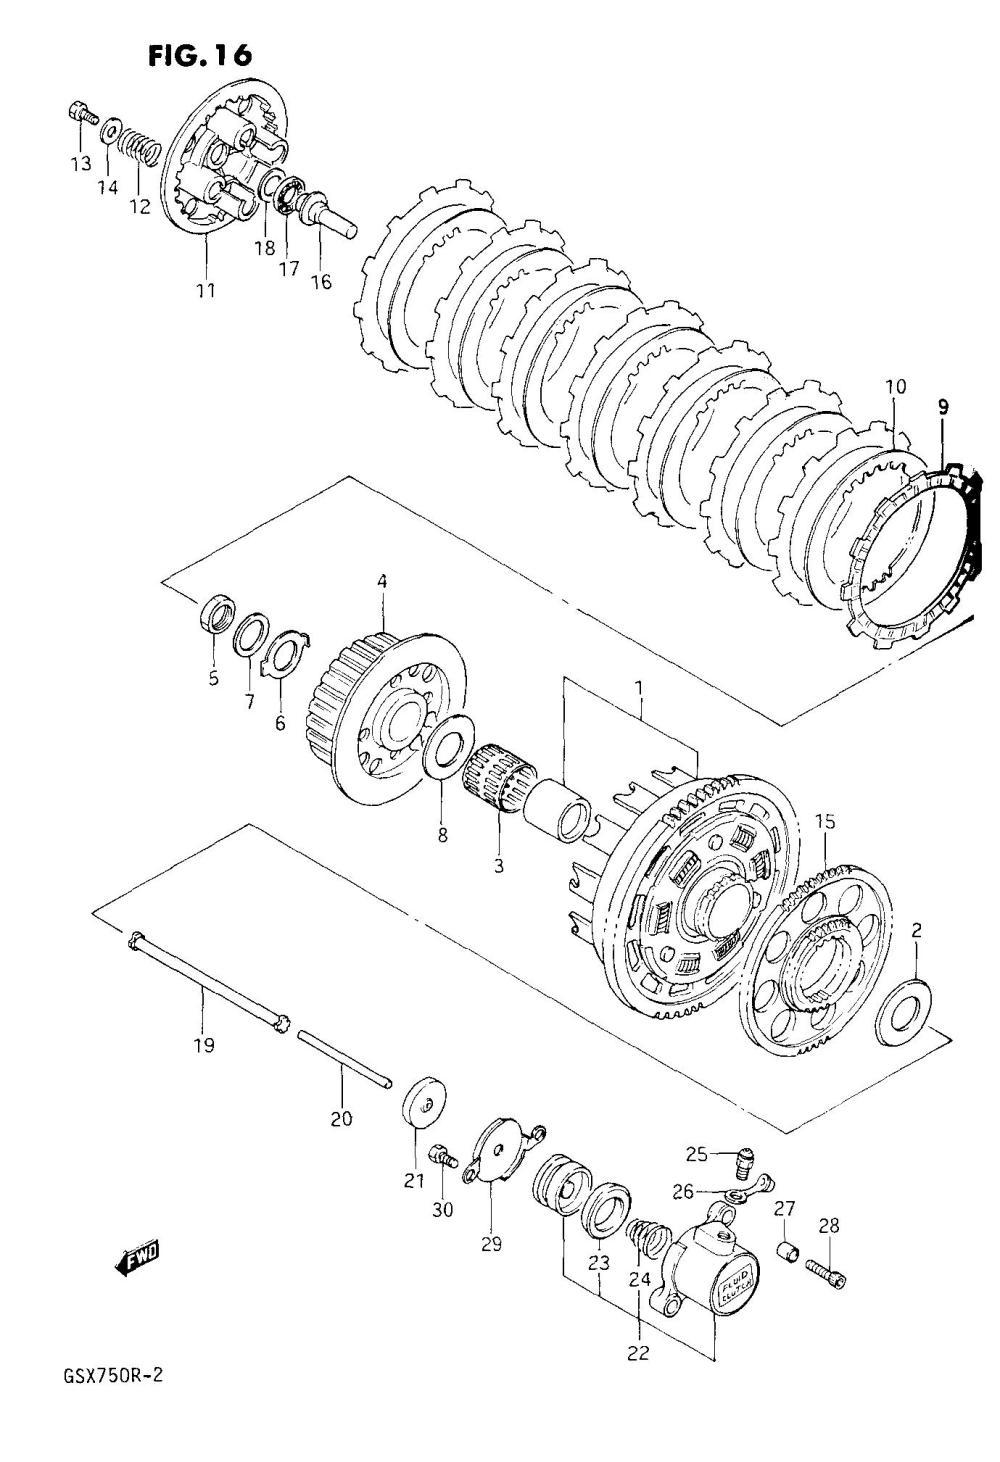 medium resolution of suzuki gsxr 600 fuse box wiring diagram suzuki gsxr 1000 fuse box location suzuki gsxr 600